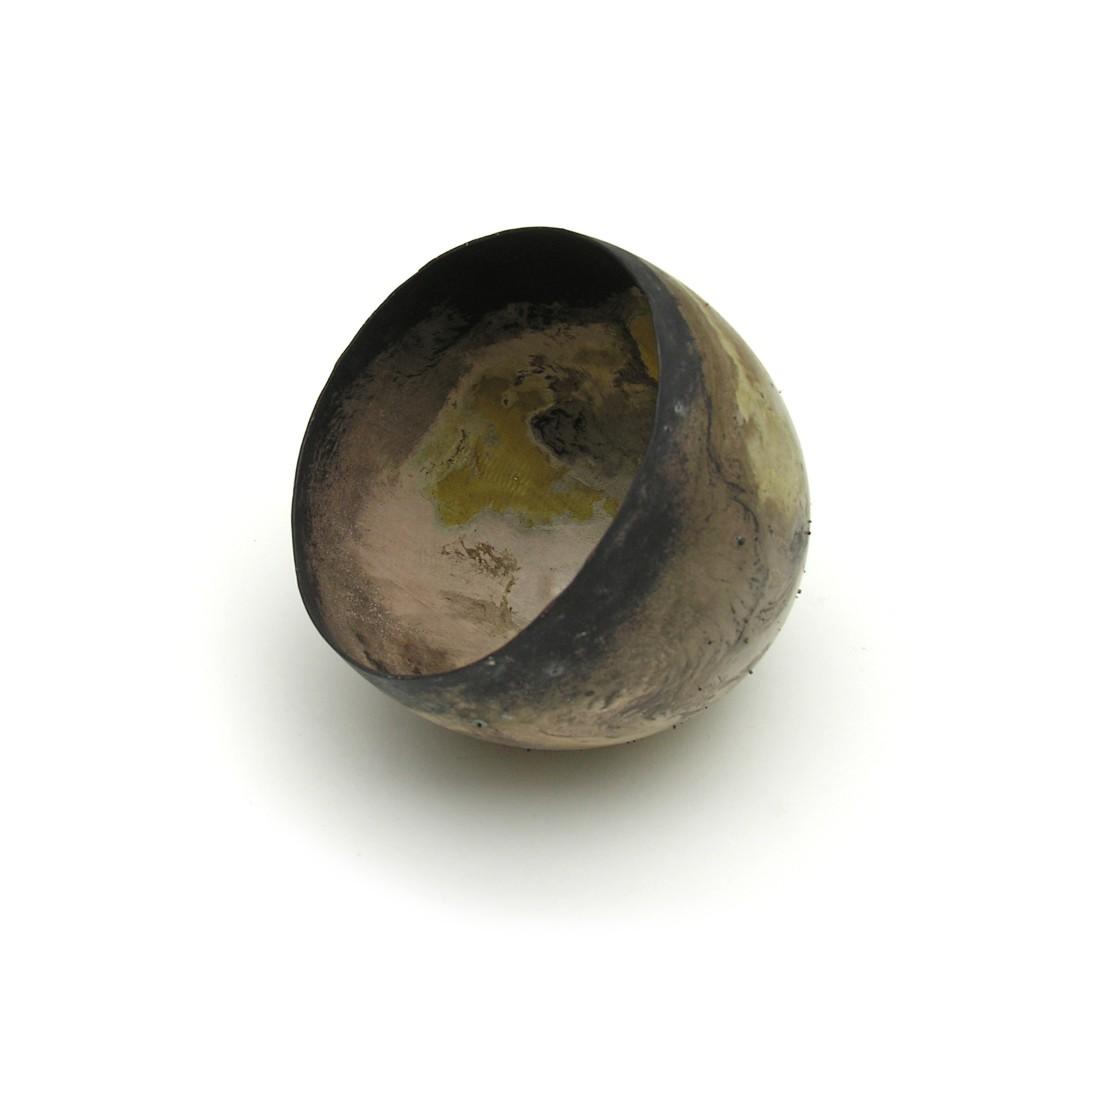 Peter Bauhuis, Object, 2013